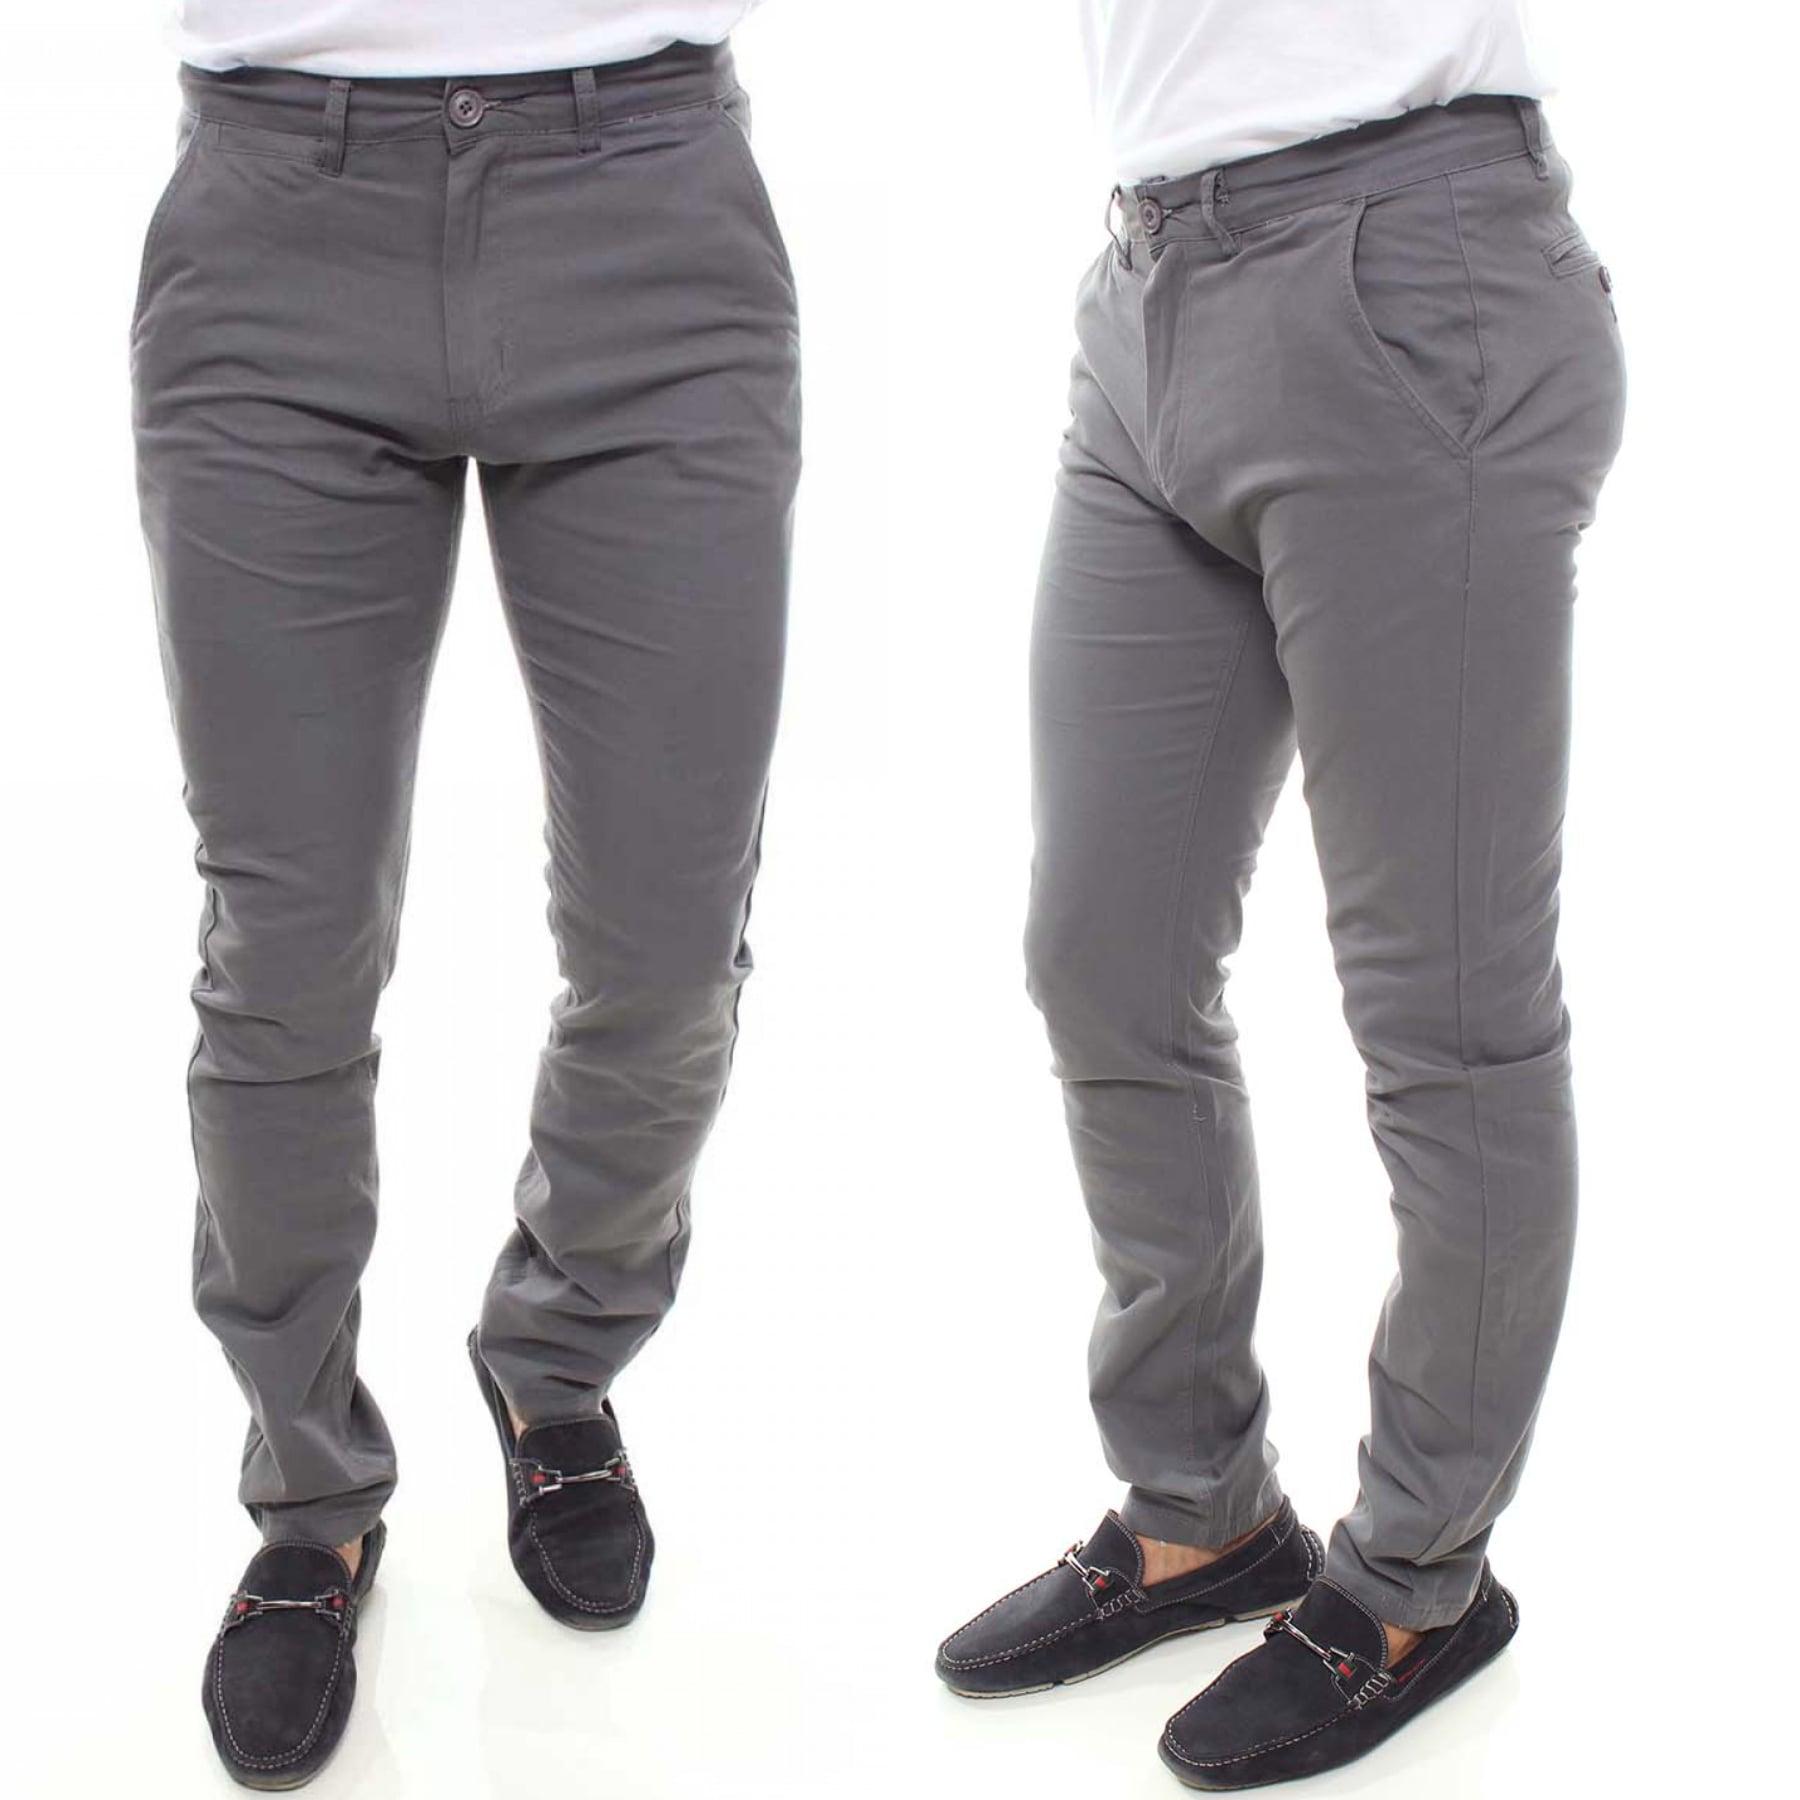 Calça Jeans Masculina Sarja Confort